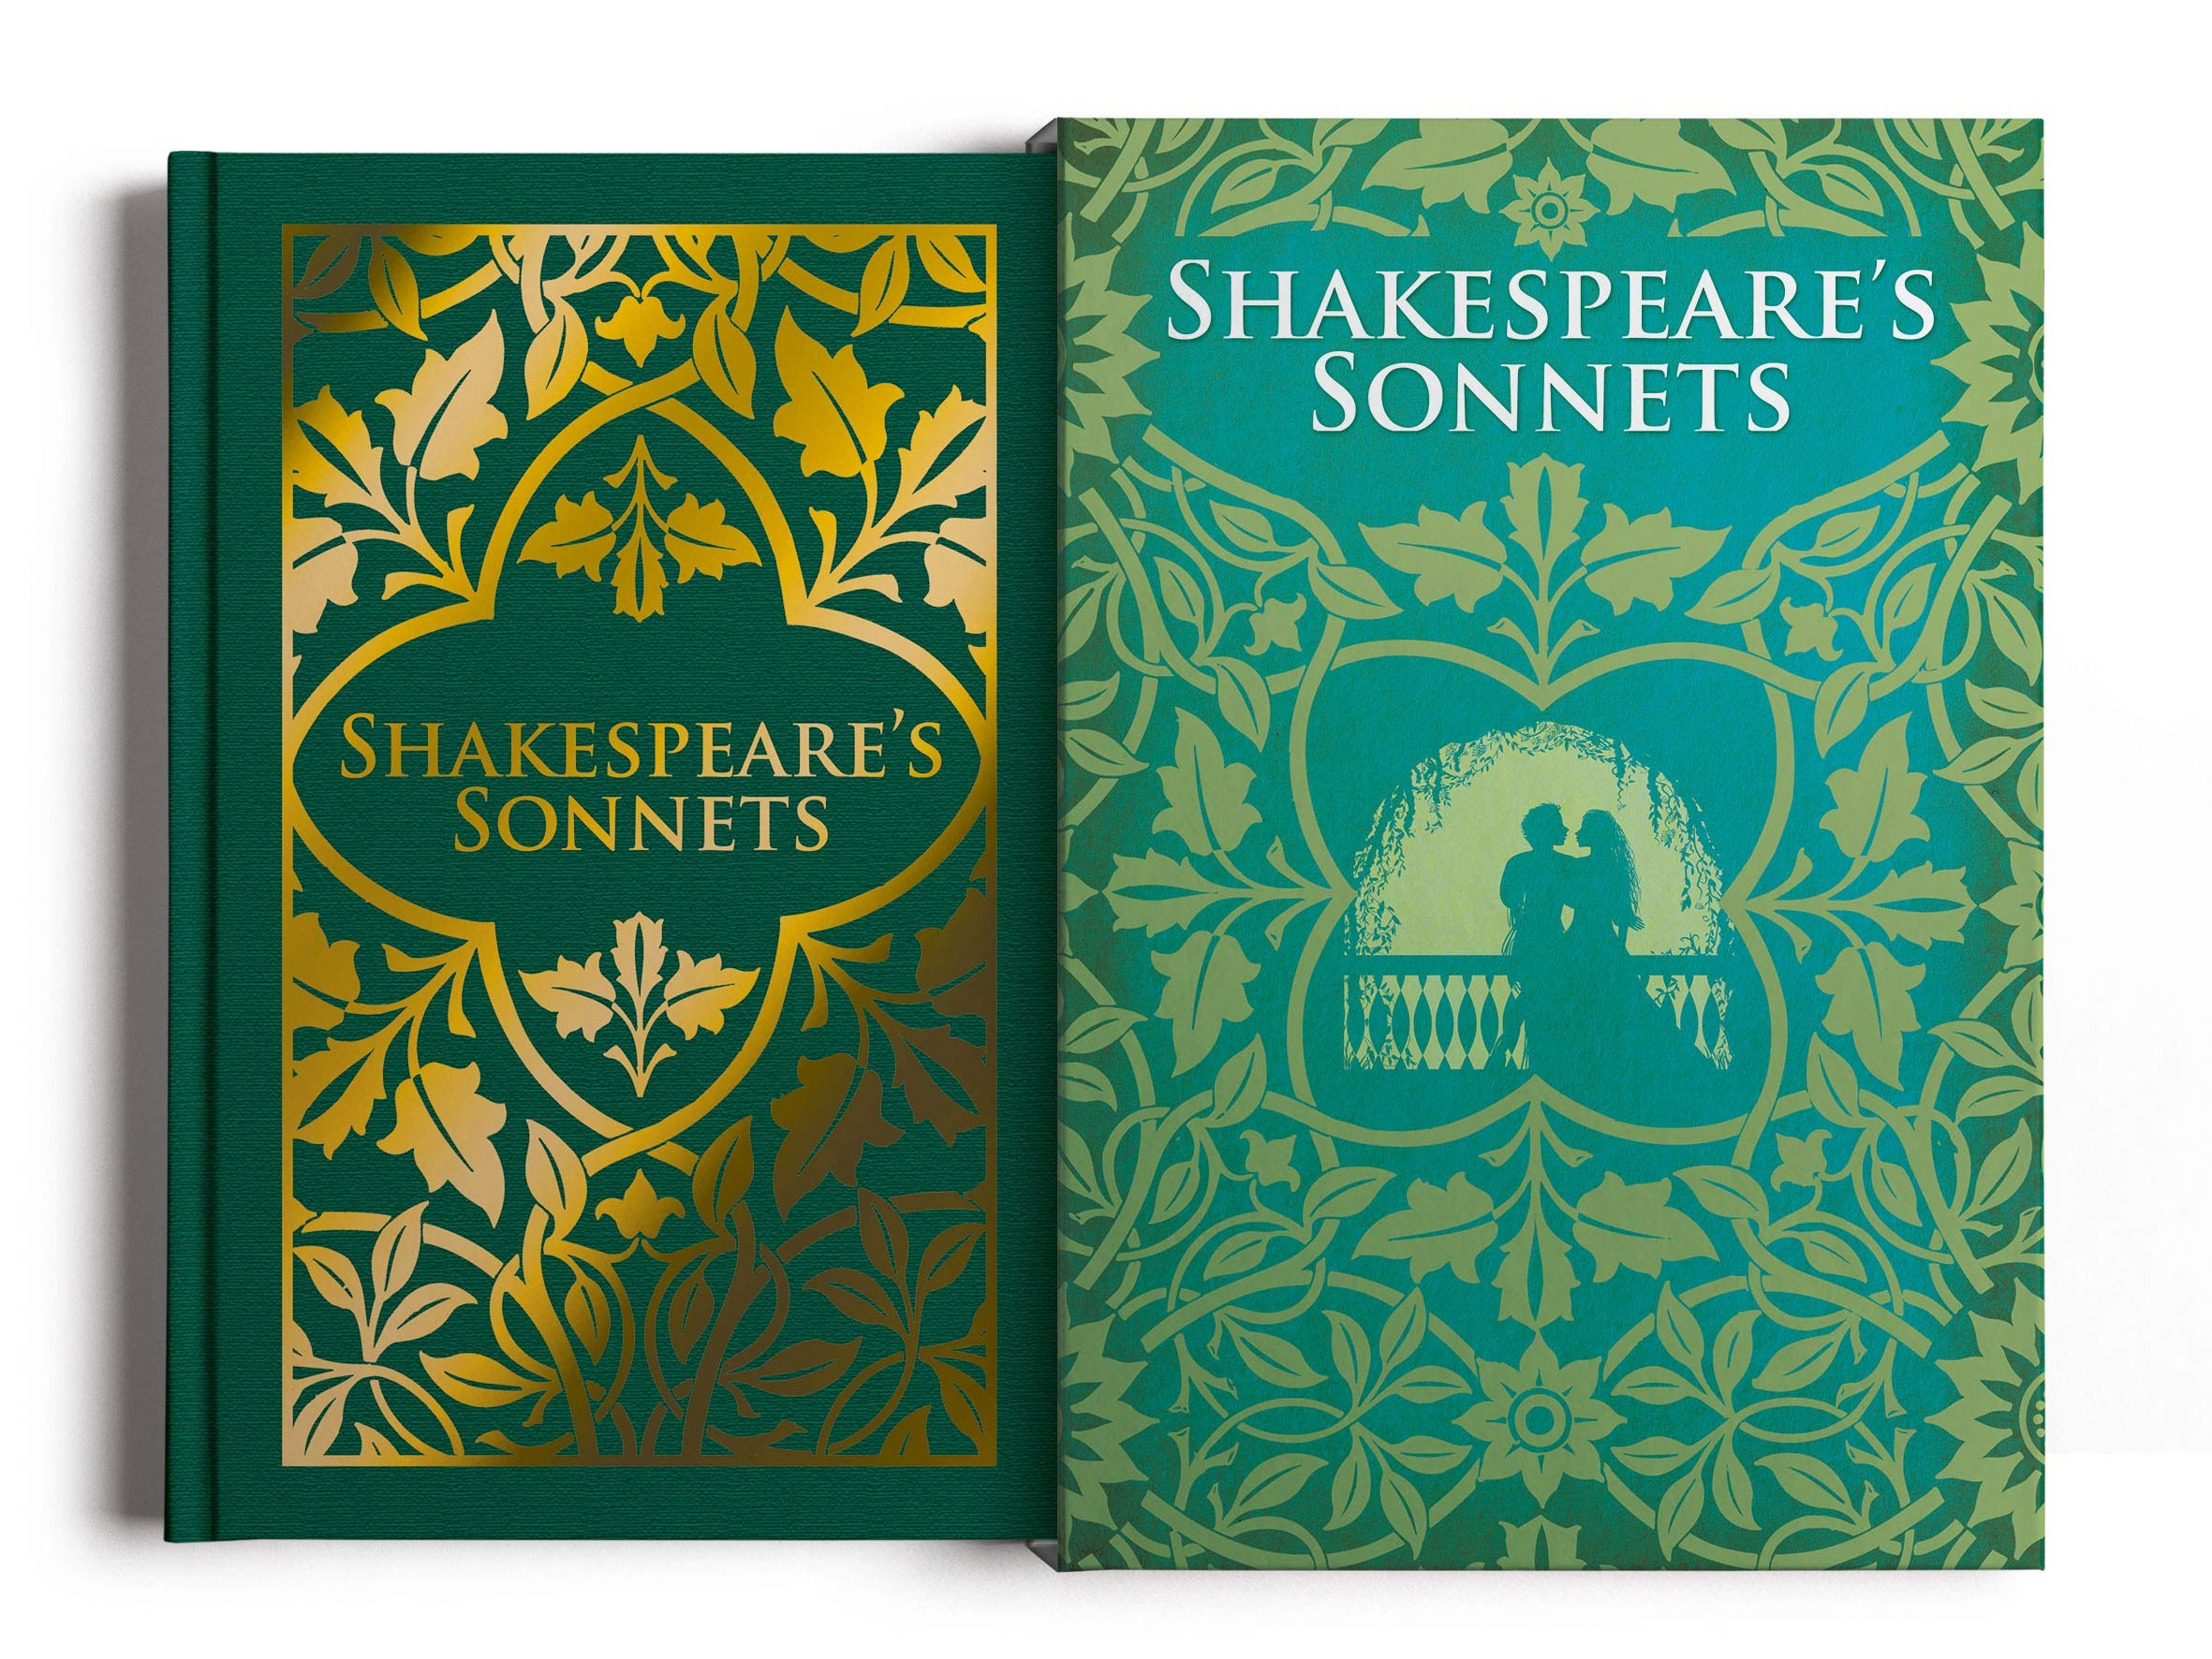 Shakespeare Hour Live: Shakespeare's Sonnets